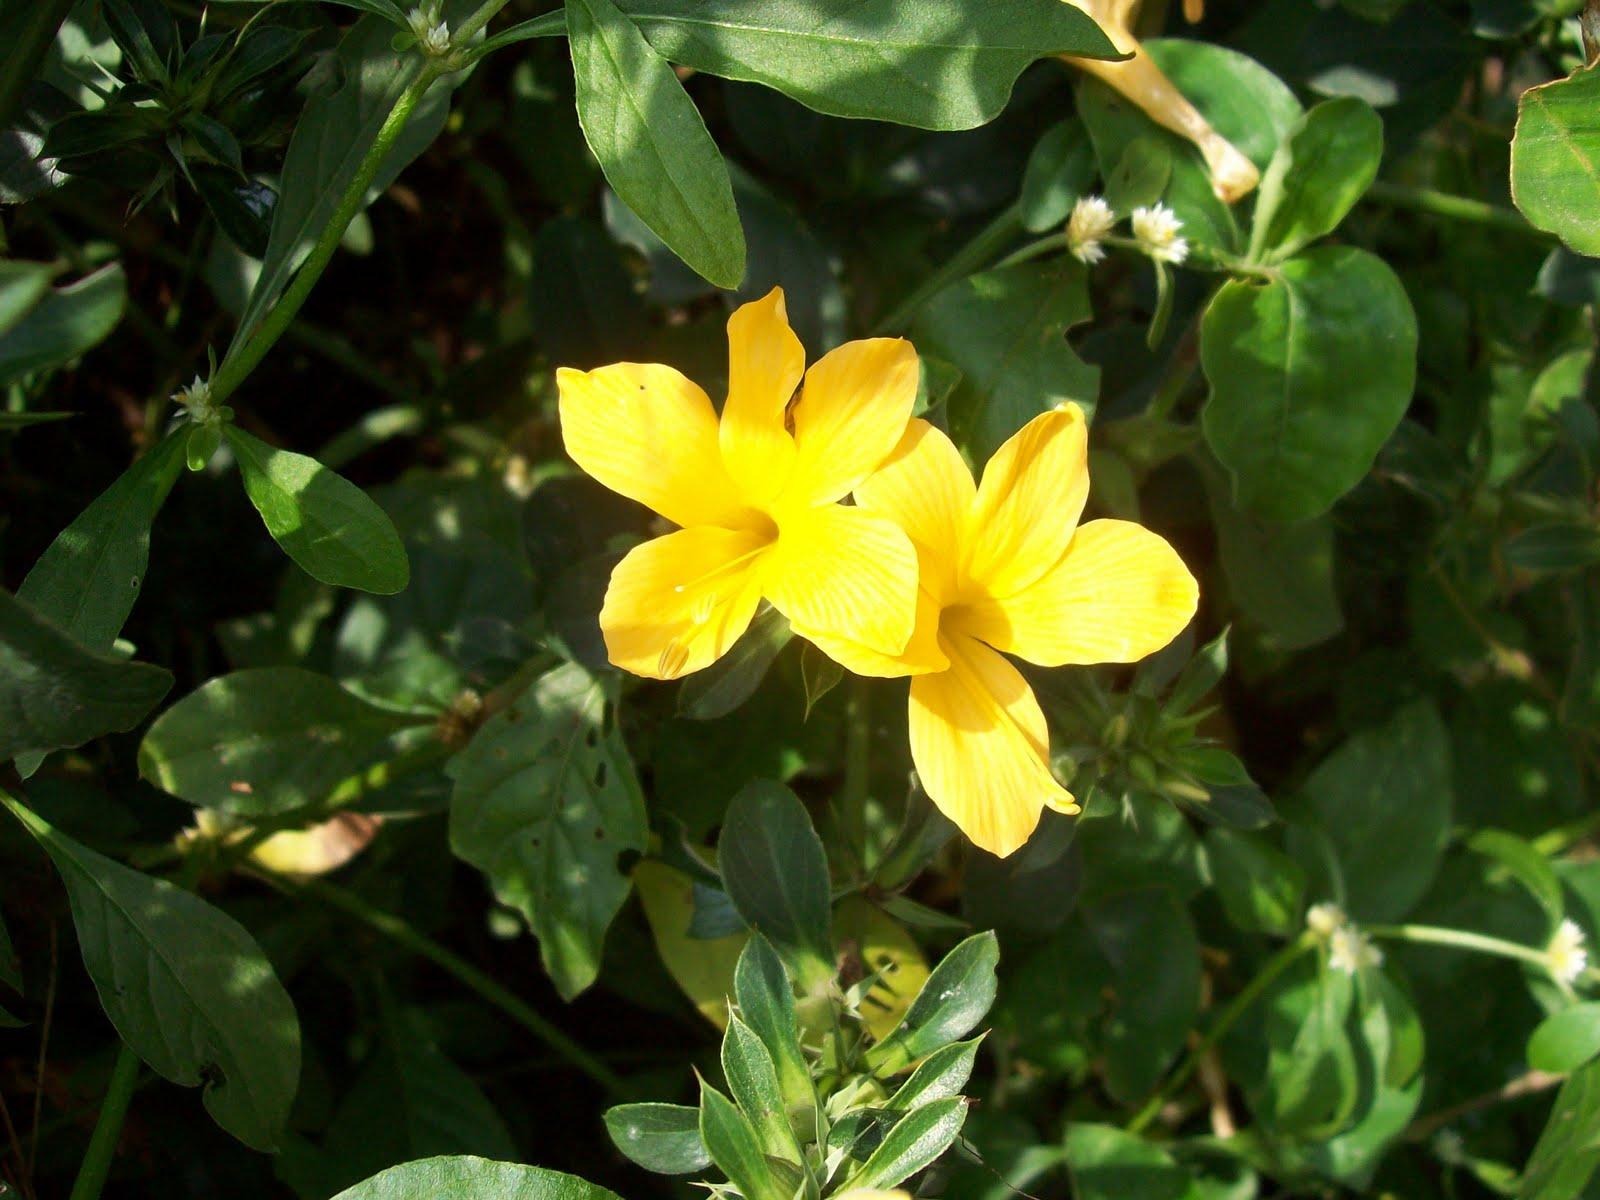 Yellow Barleria – झिंटी, कटसरैया